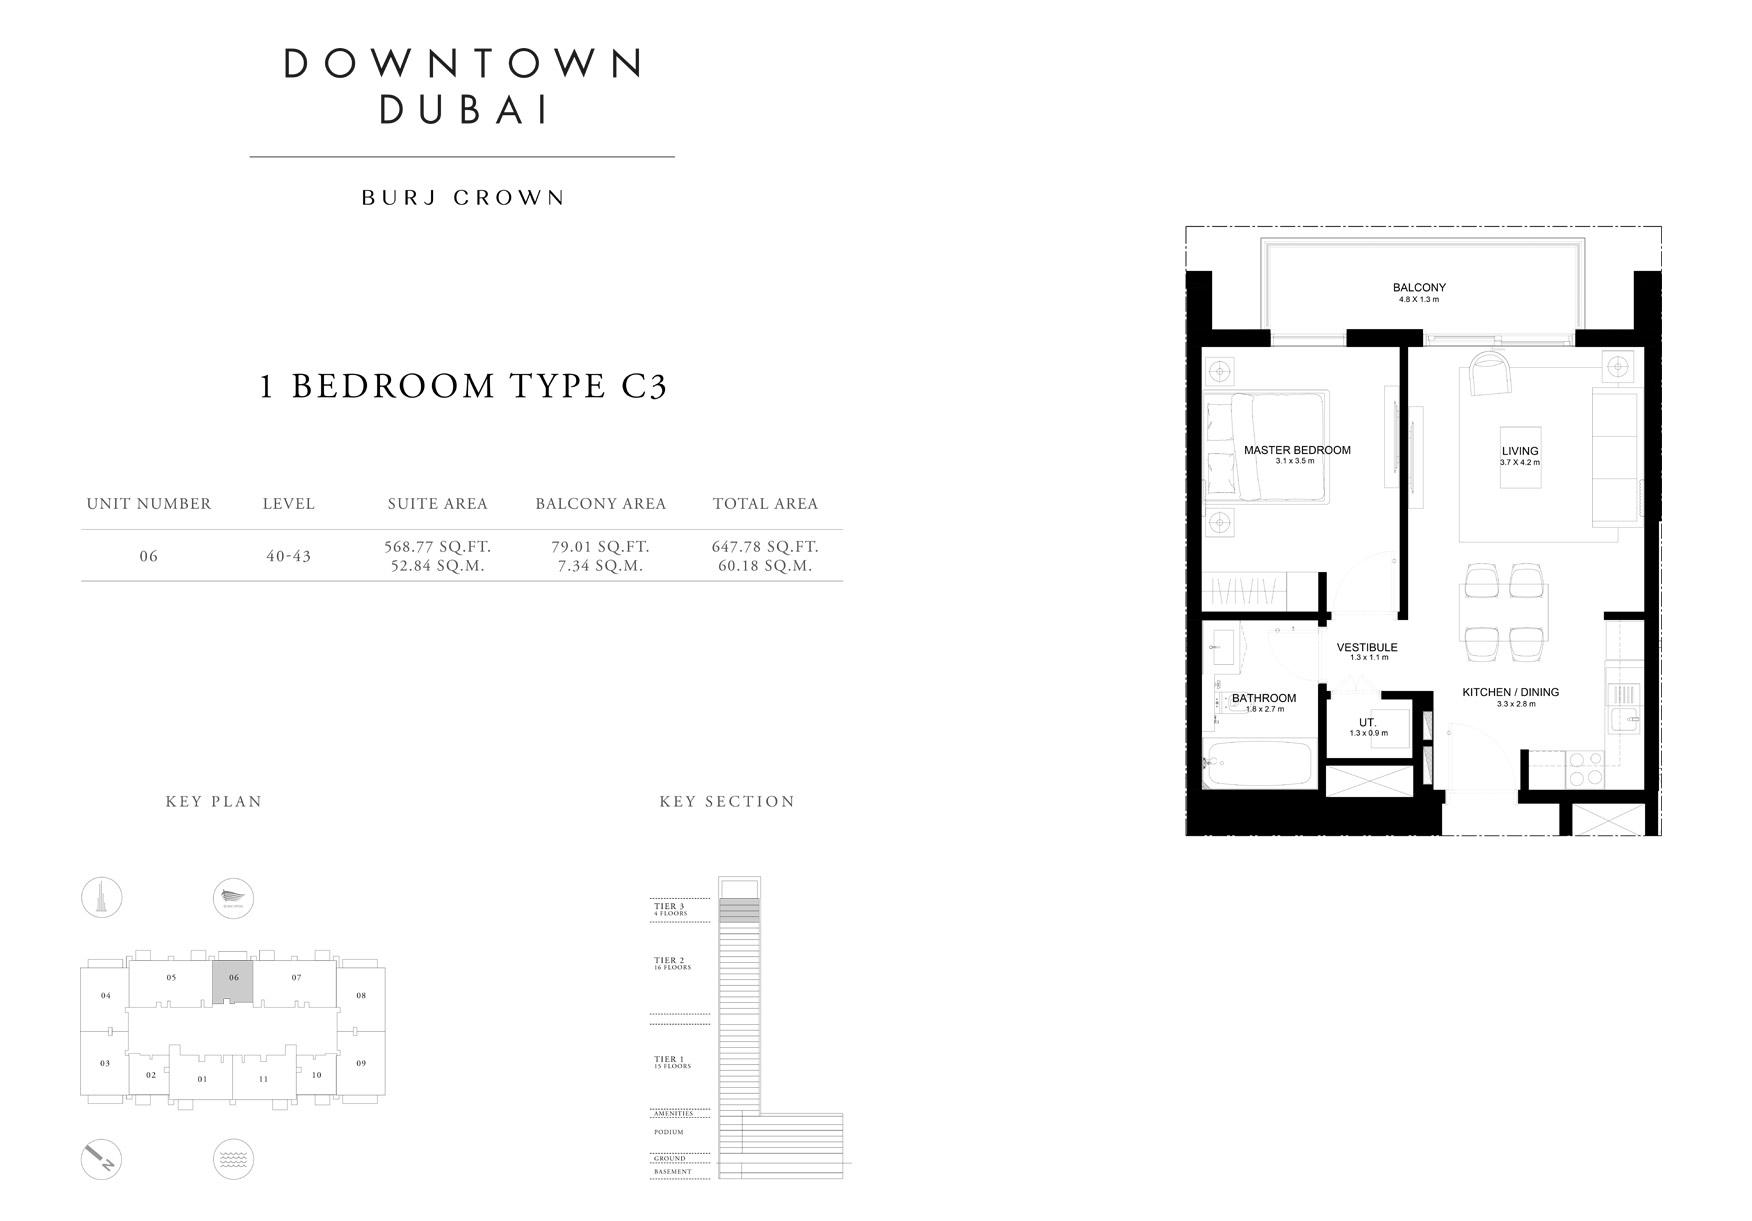 1 Bedroom  Type C3, Size 647 sq ft